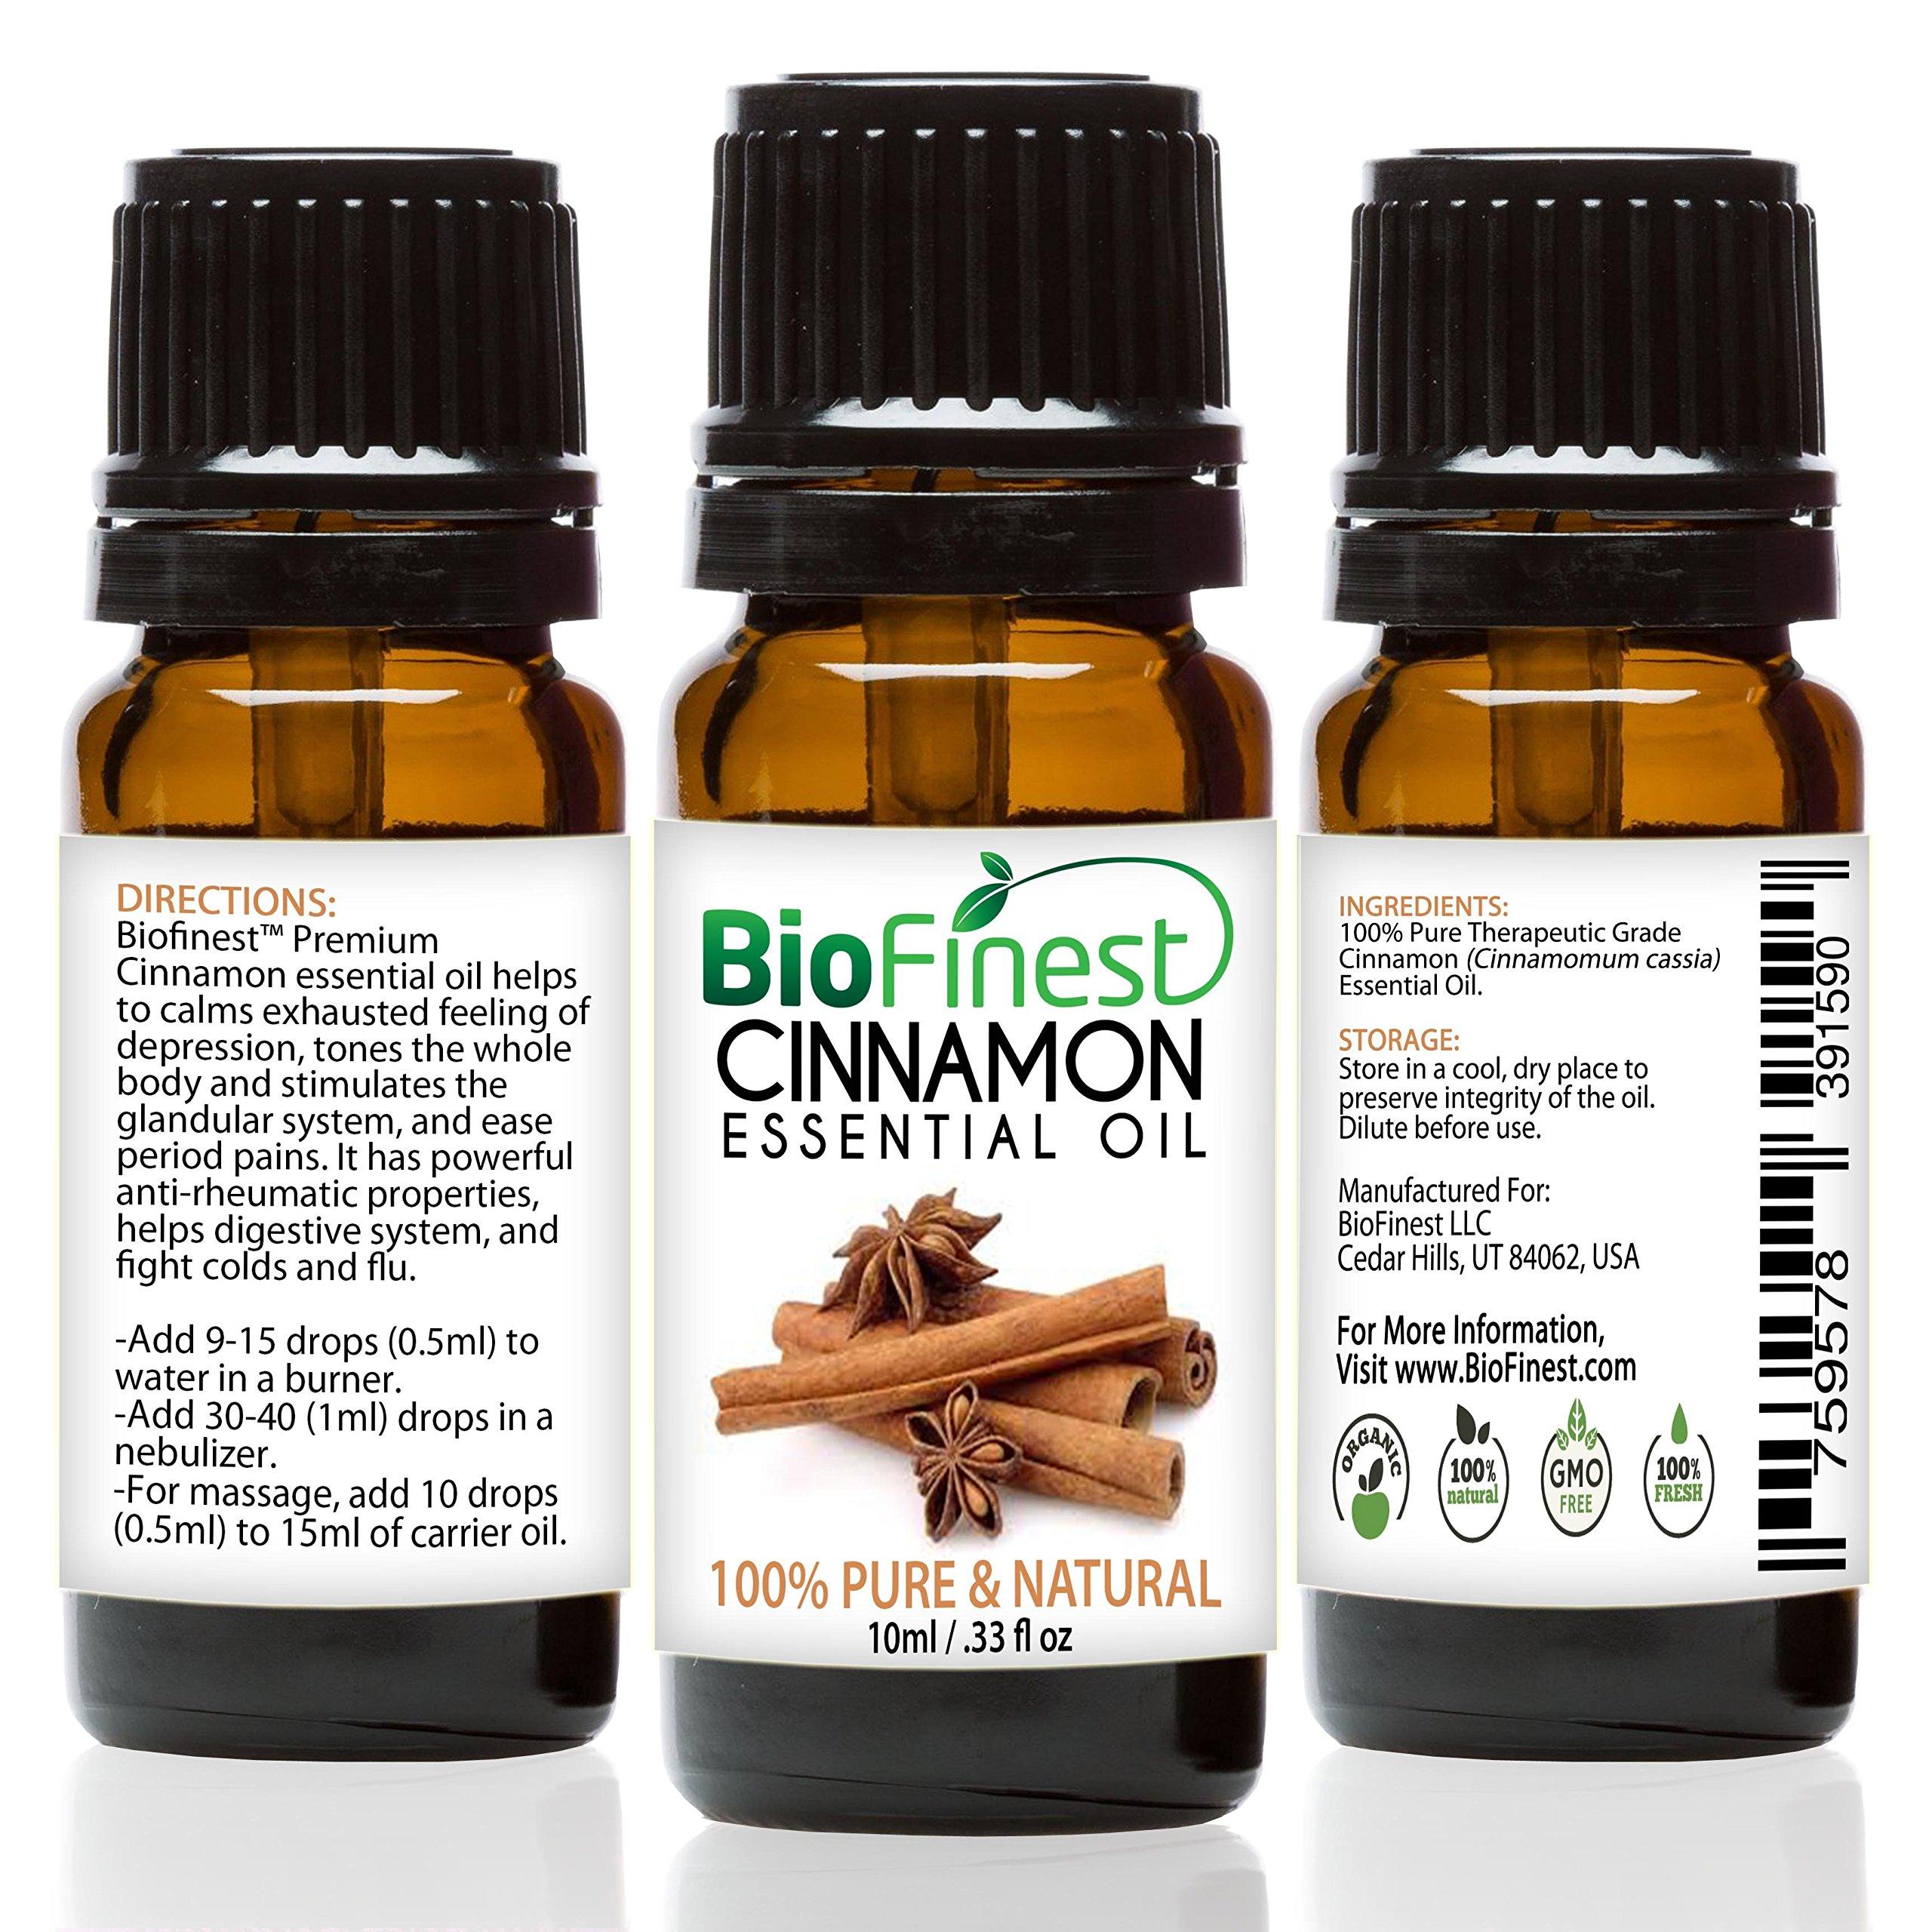 BioFinest Cinnamon (Cassia) Oil - 100% Pure Cinnamon Essential Oil - Premium Organic - Therapeutic Grade - Best For Aromatherapy - Aid Blood Circulation & Muscle Ache - FREE Essential Oil Guide (10ml)